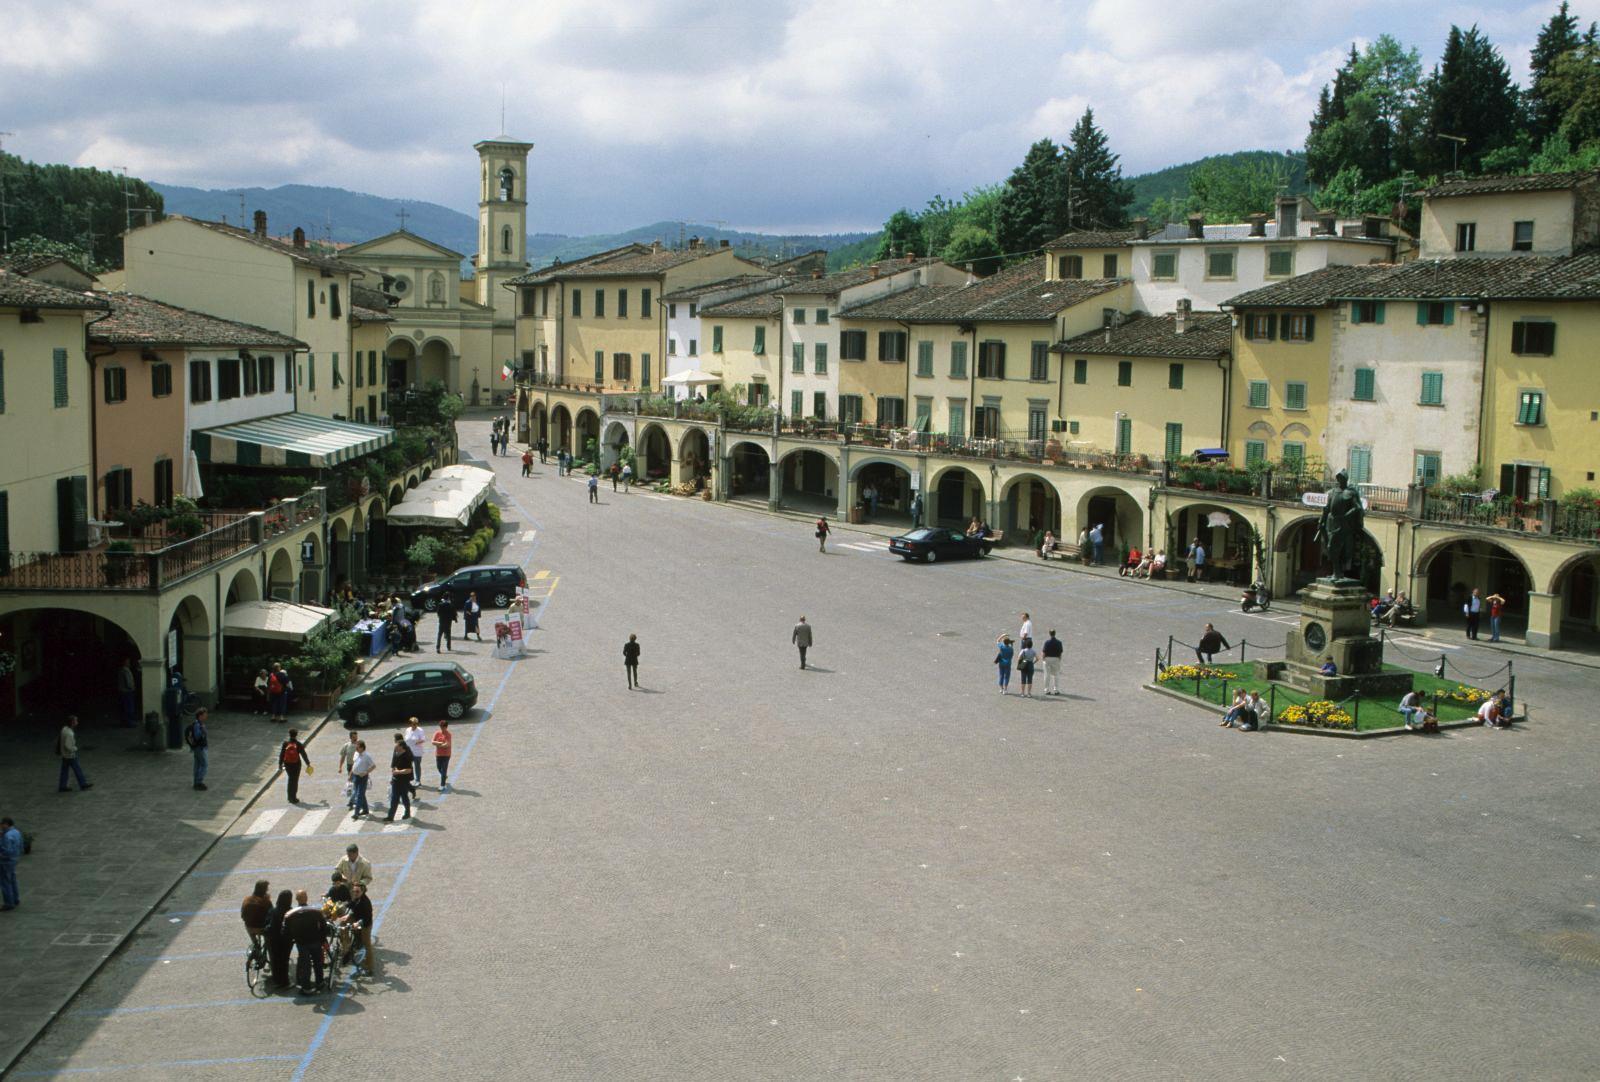 Greve in Chianti (FI)